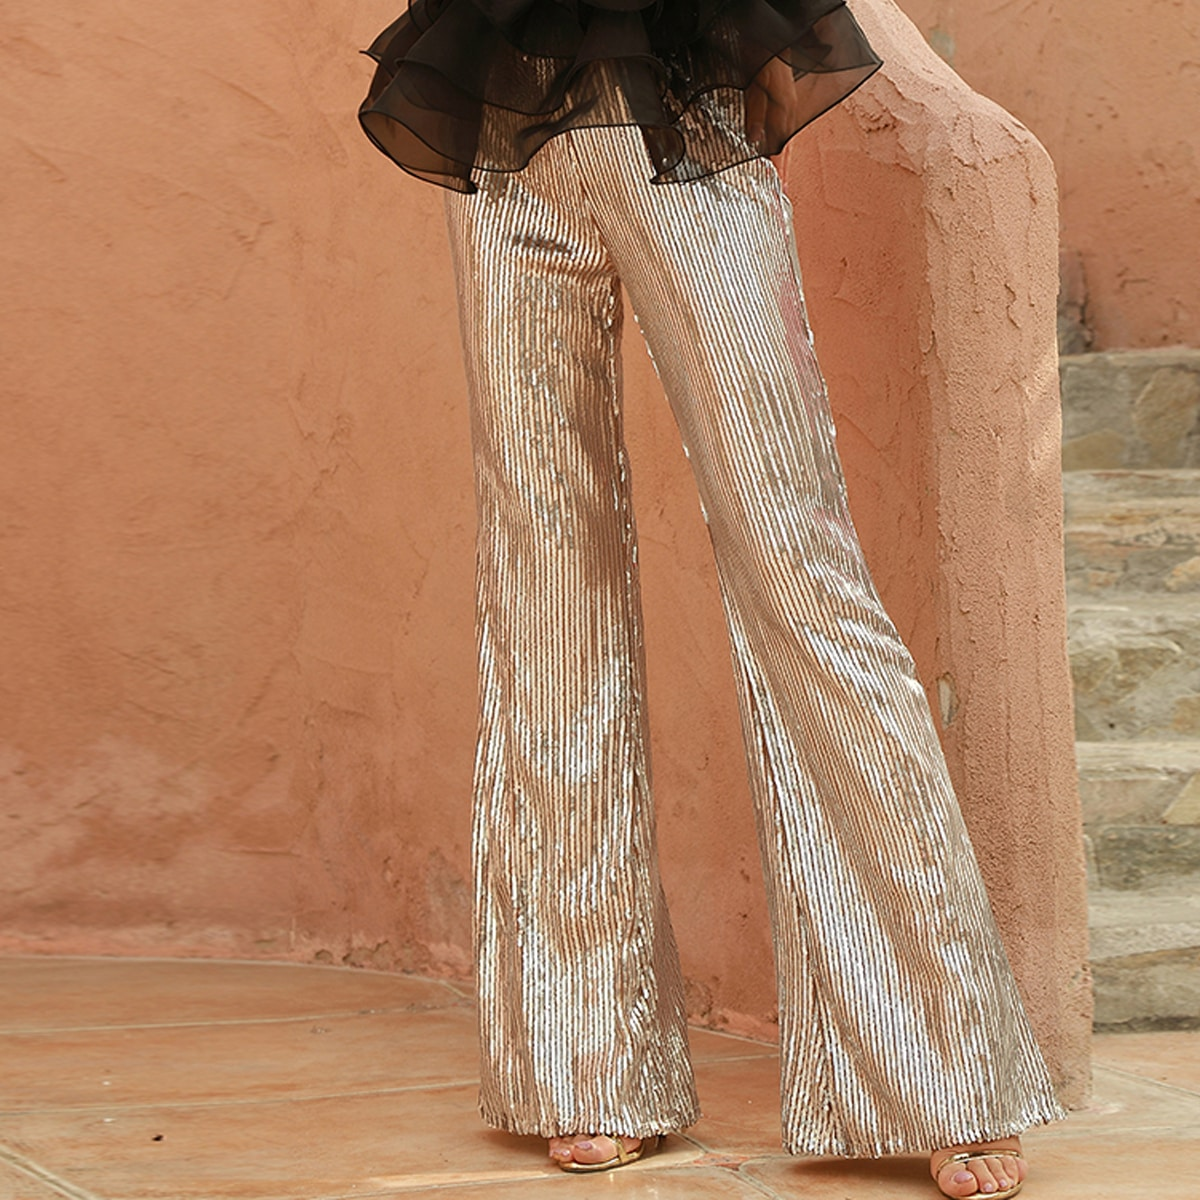 SHEIN / DKRX pantalones con lentejuelas de cintura alta